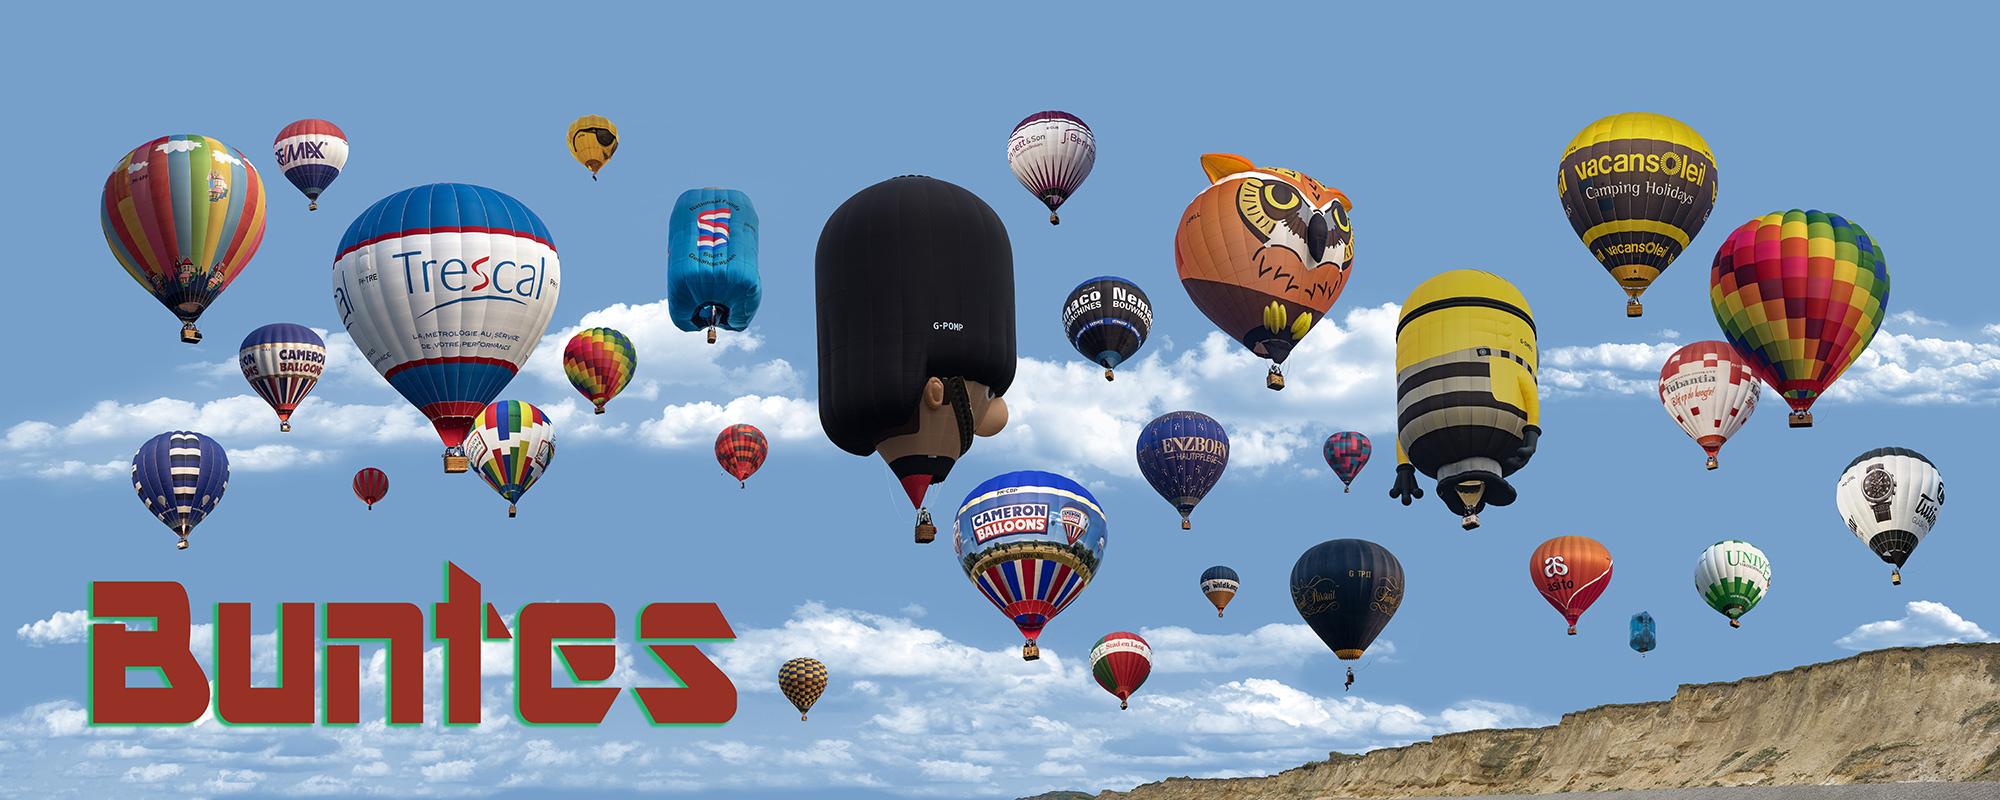 twente ballooning festival